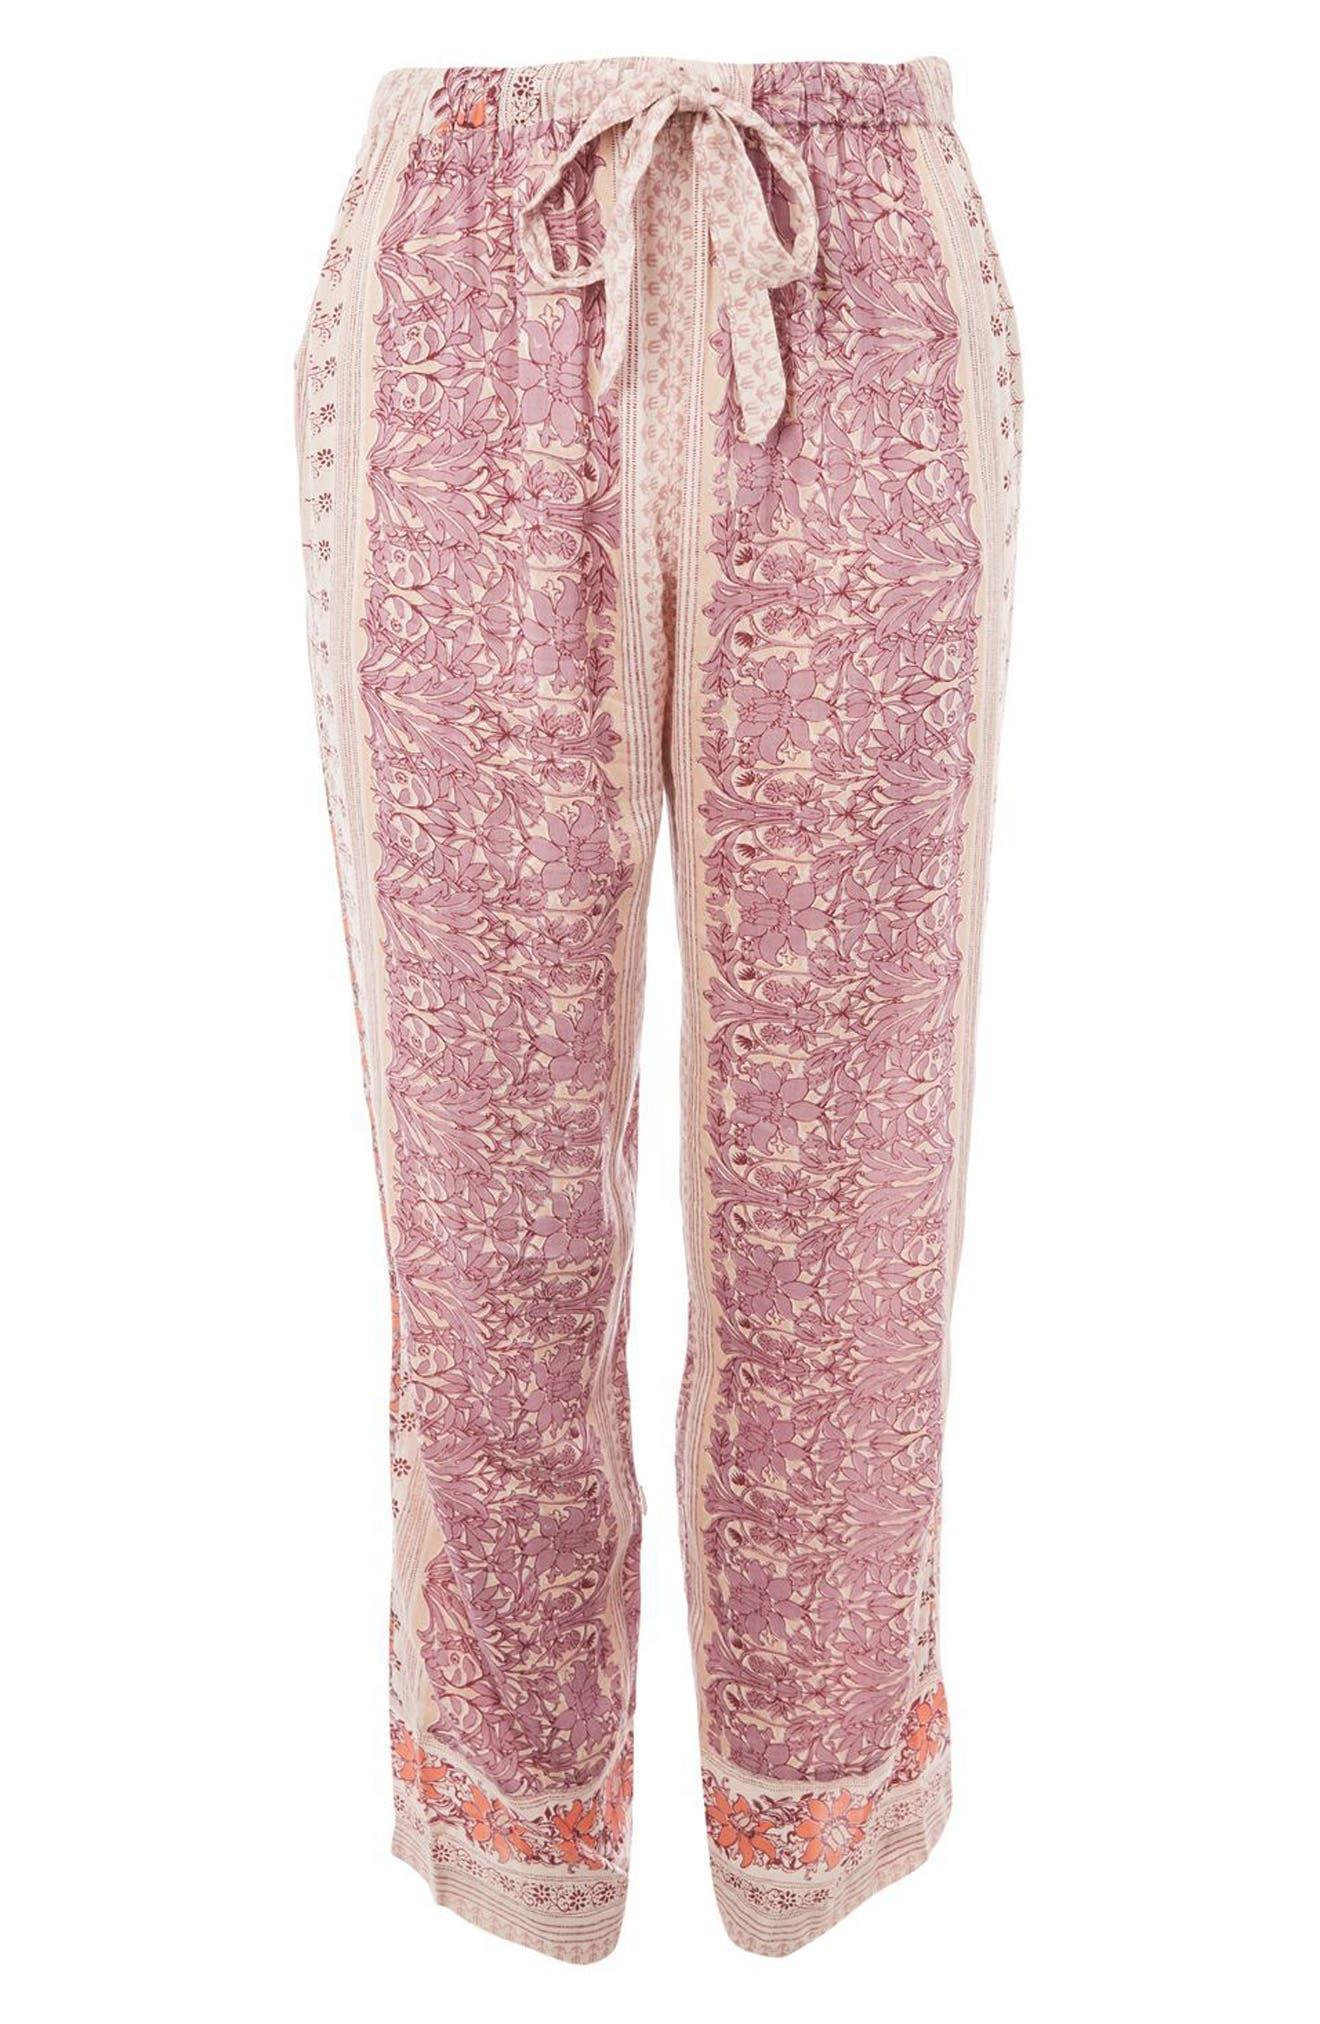 Bohemian Floral Print Pajama Pants,                             Alternate thumbnail 3, color,                             Lilac Multi